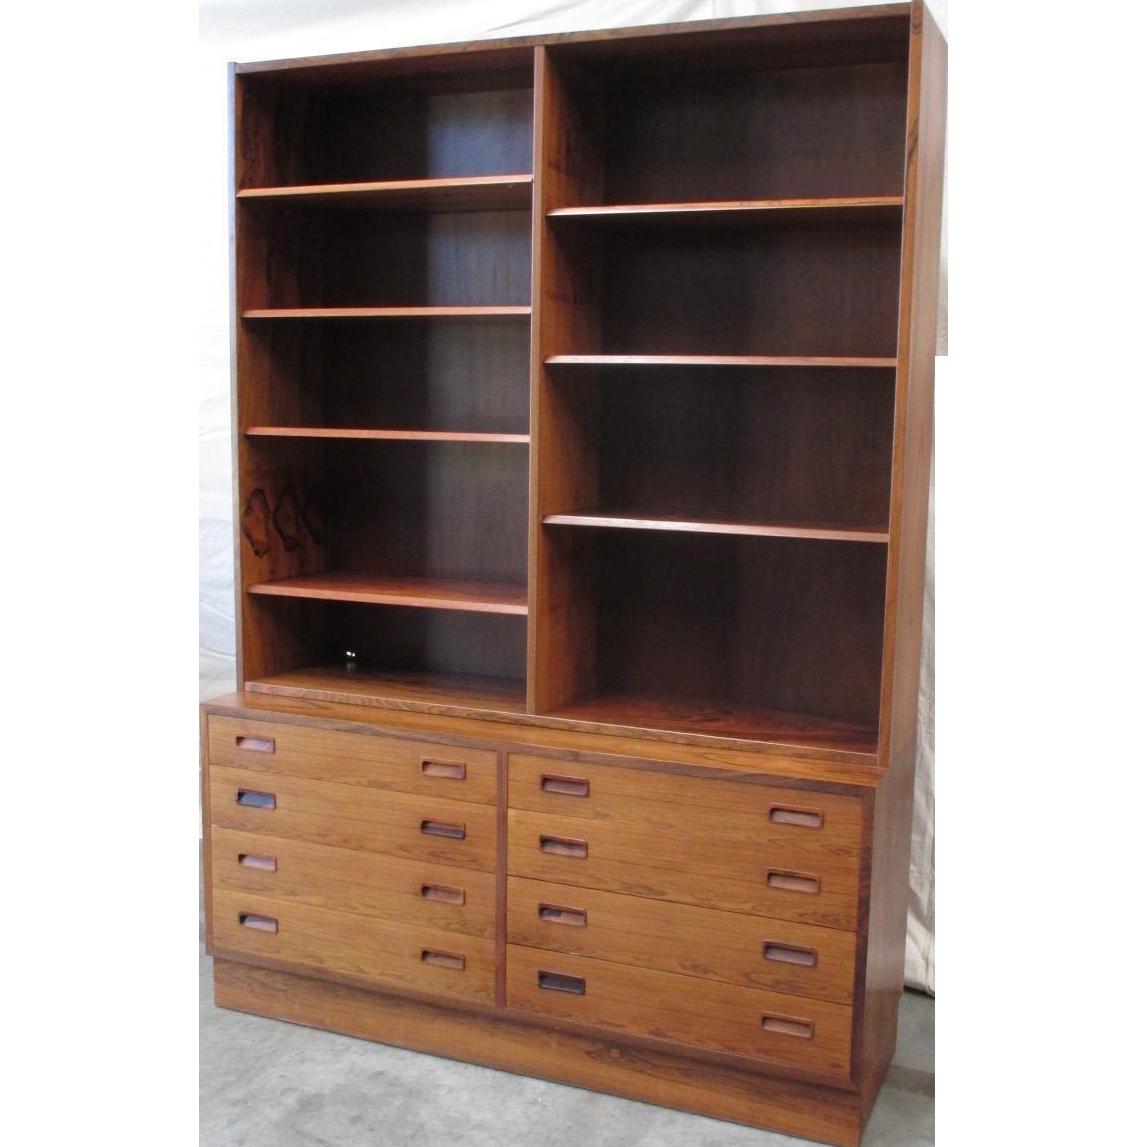 Danish Mid-Century Modern Bookcase Vintage Furniture